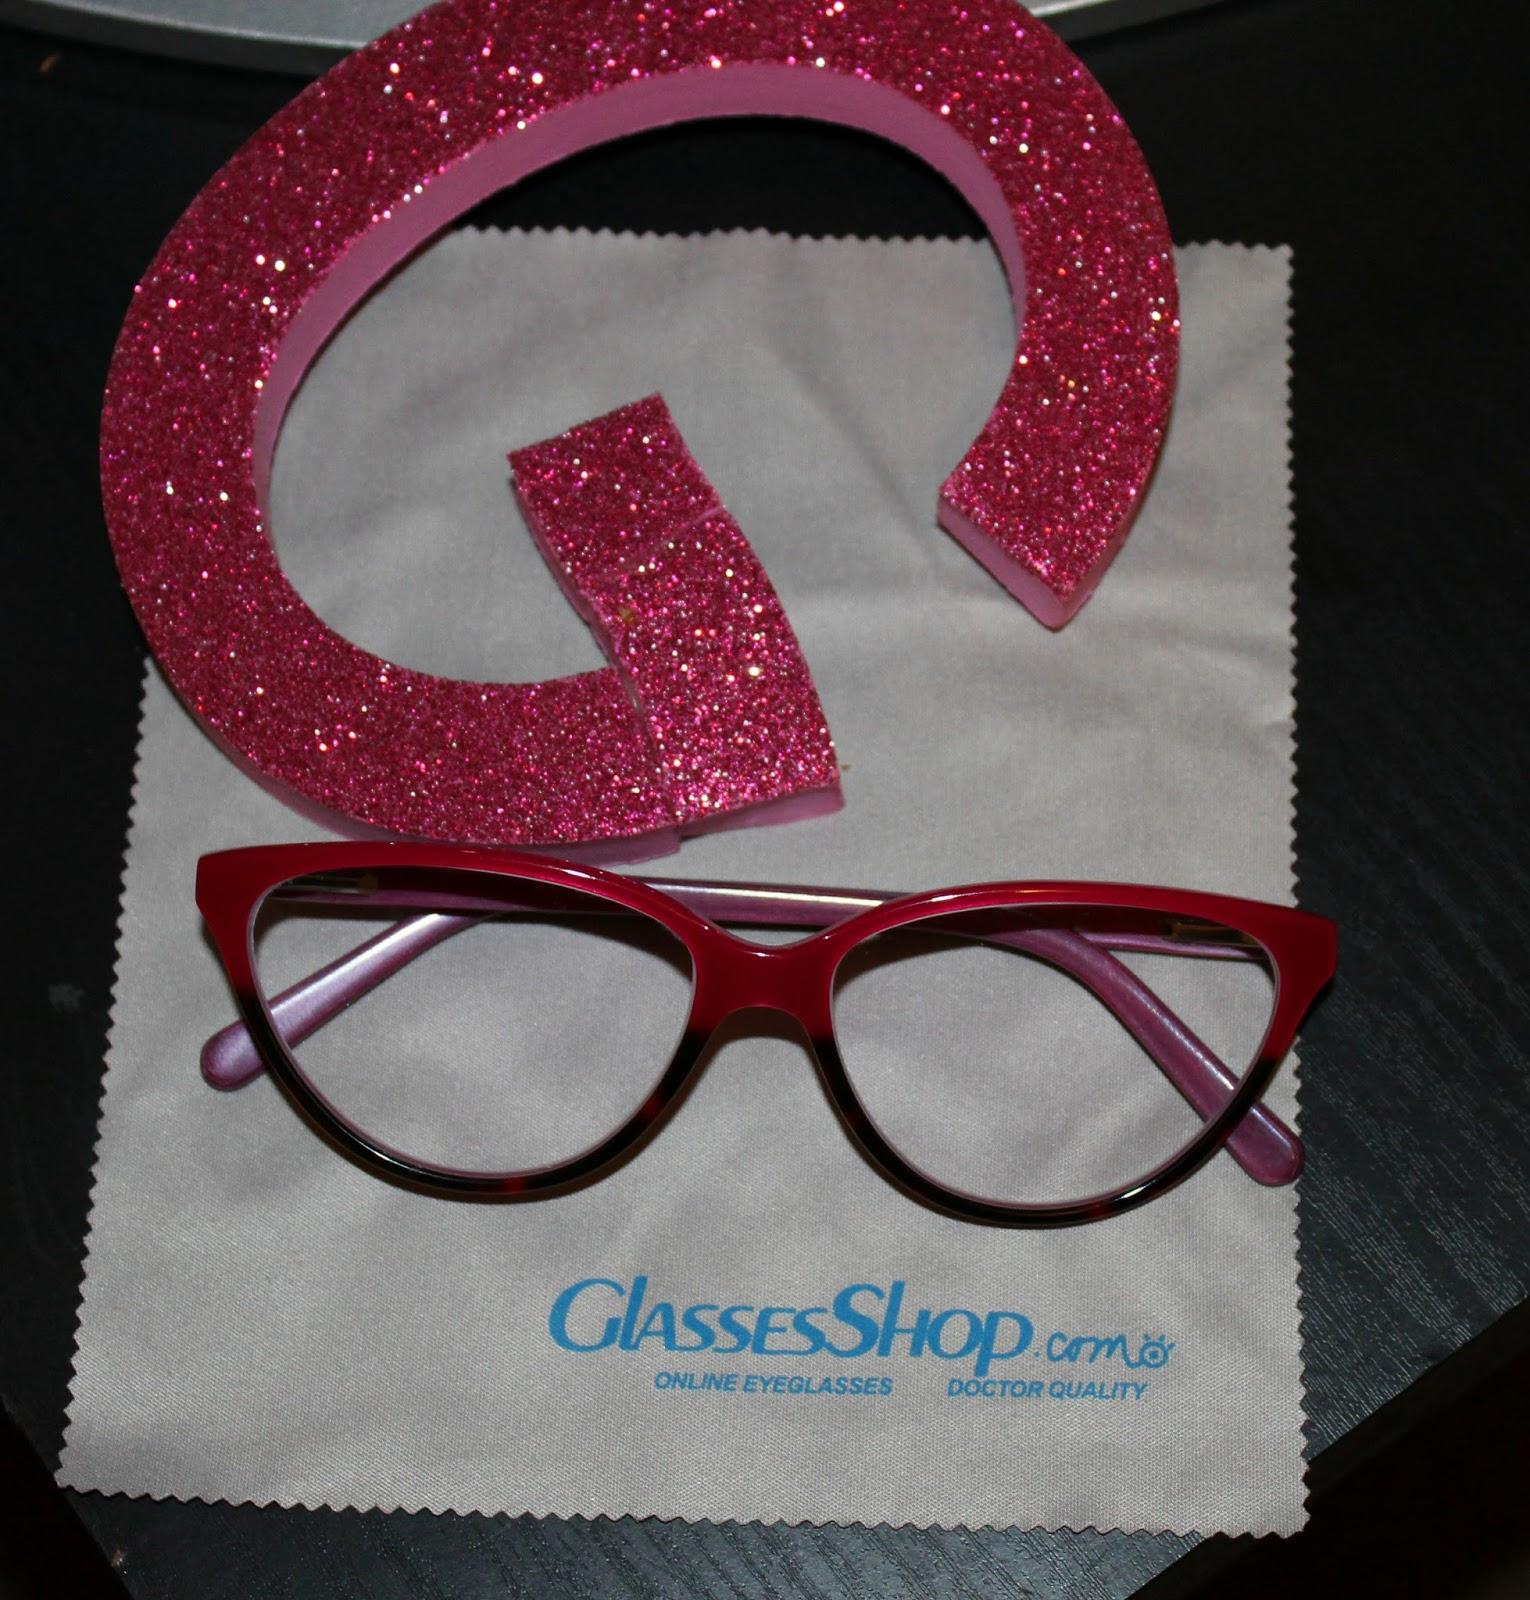 GlassesShop Eyeglasses Review - Tipsy Heelz